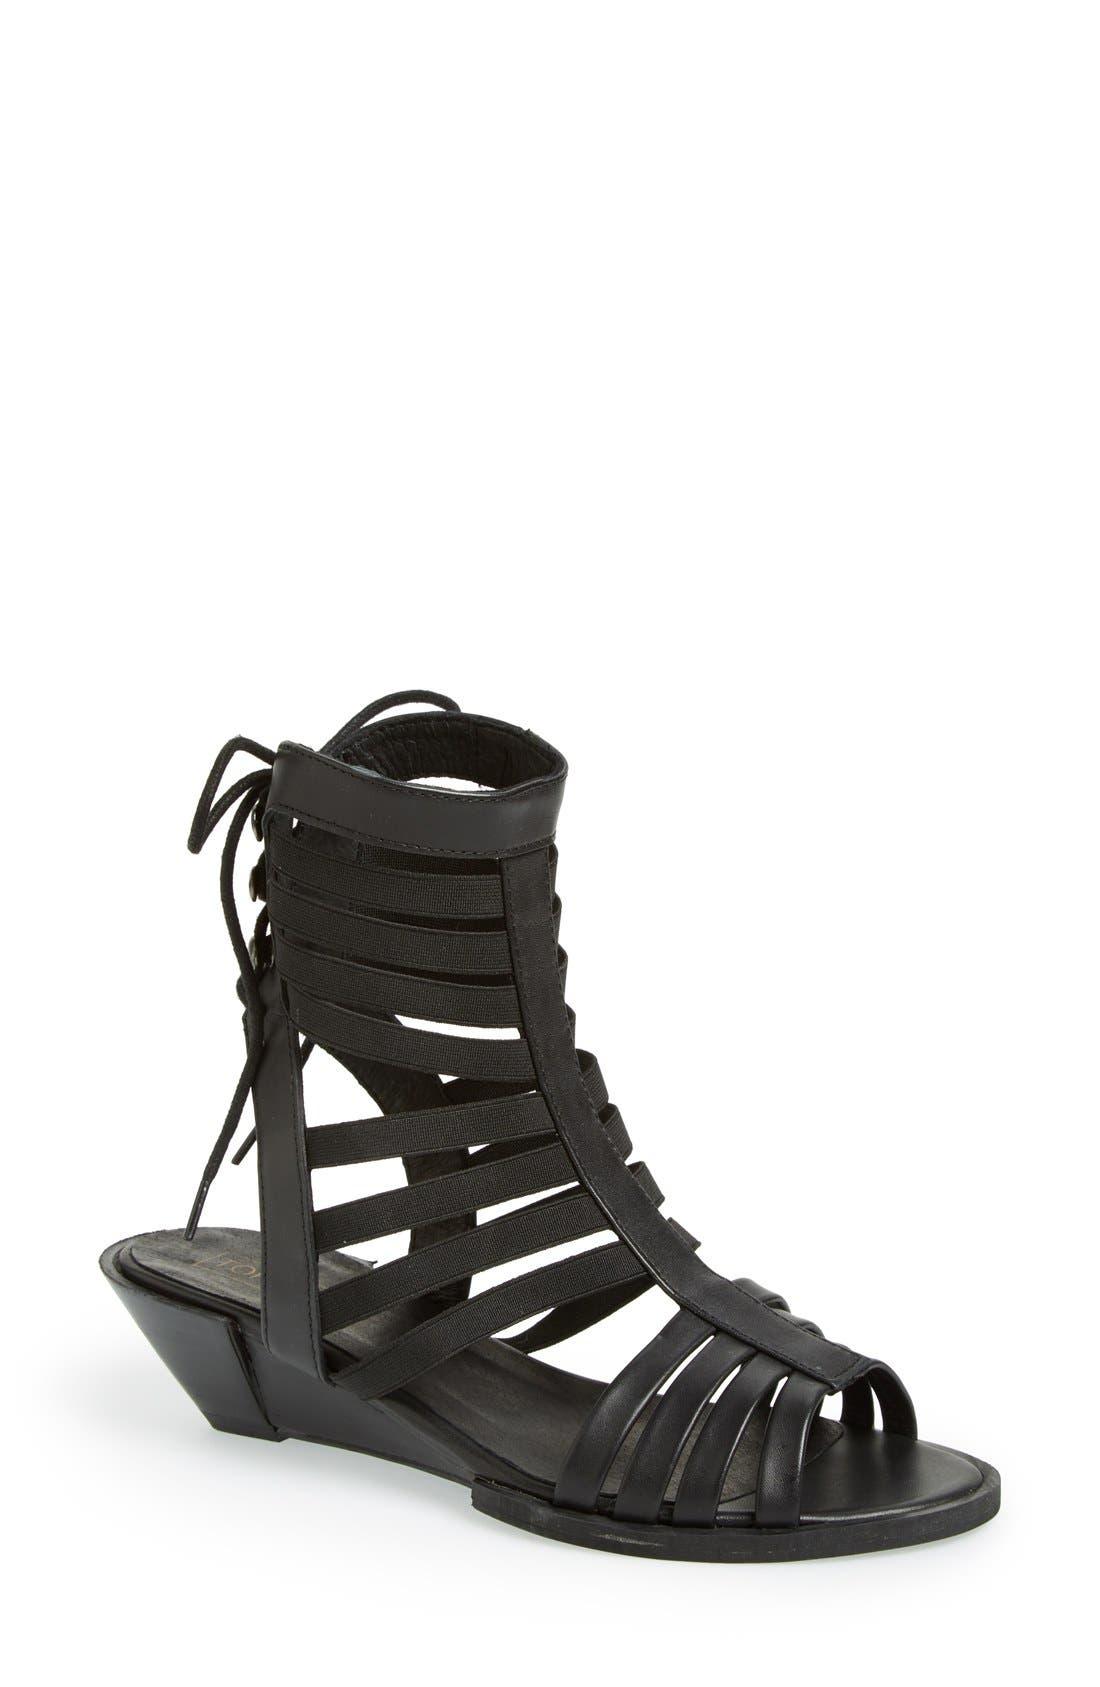 Alternate Image 1 Selected - Topshop 'Foil' Gladiator Sandal (Women)